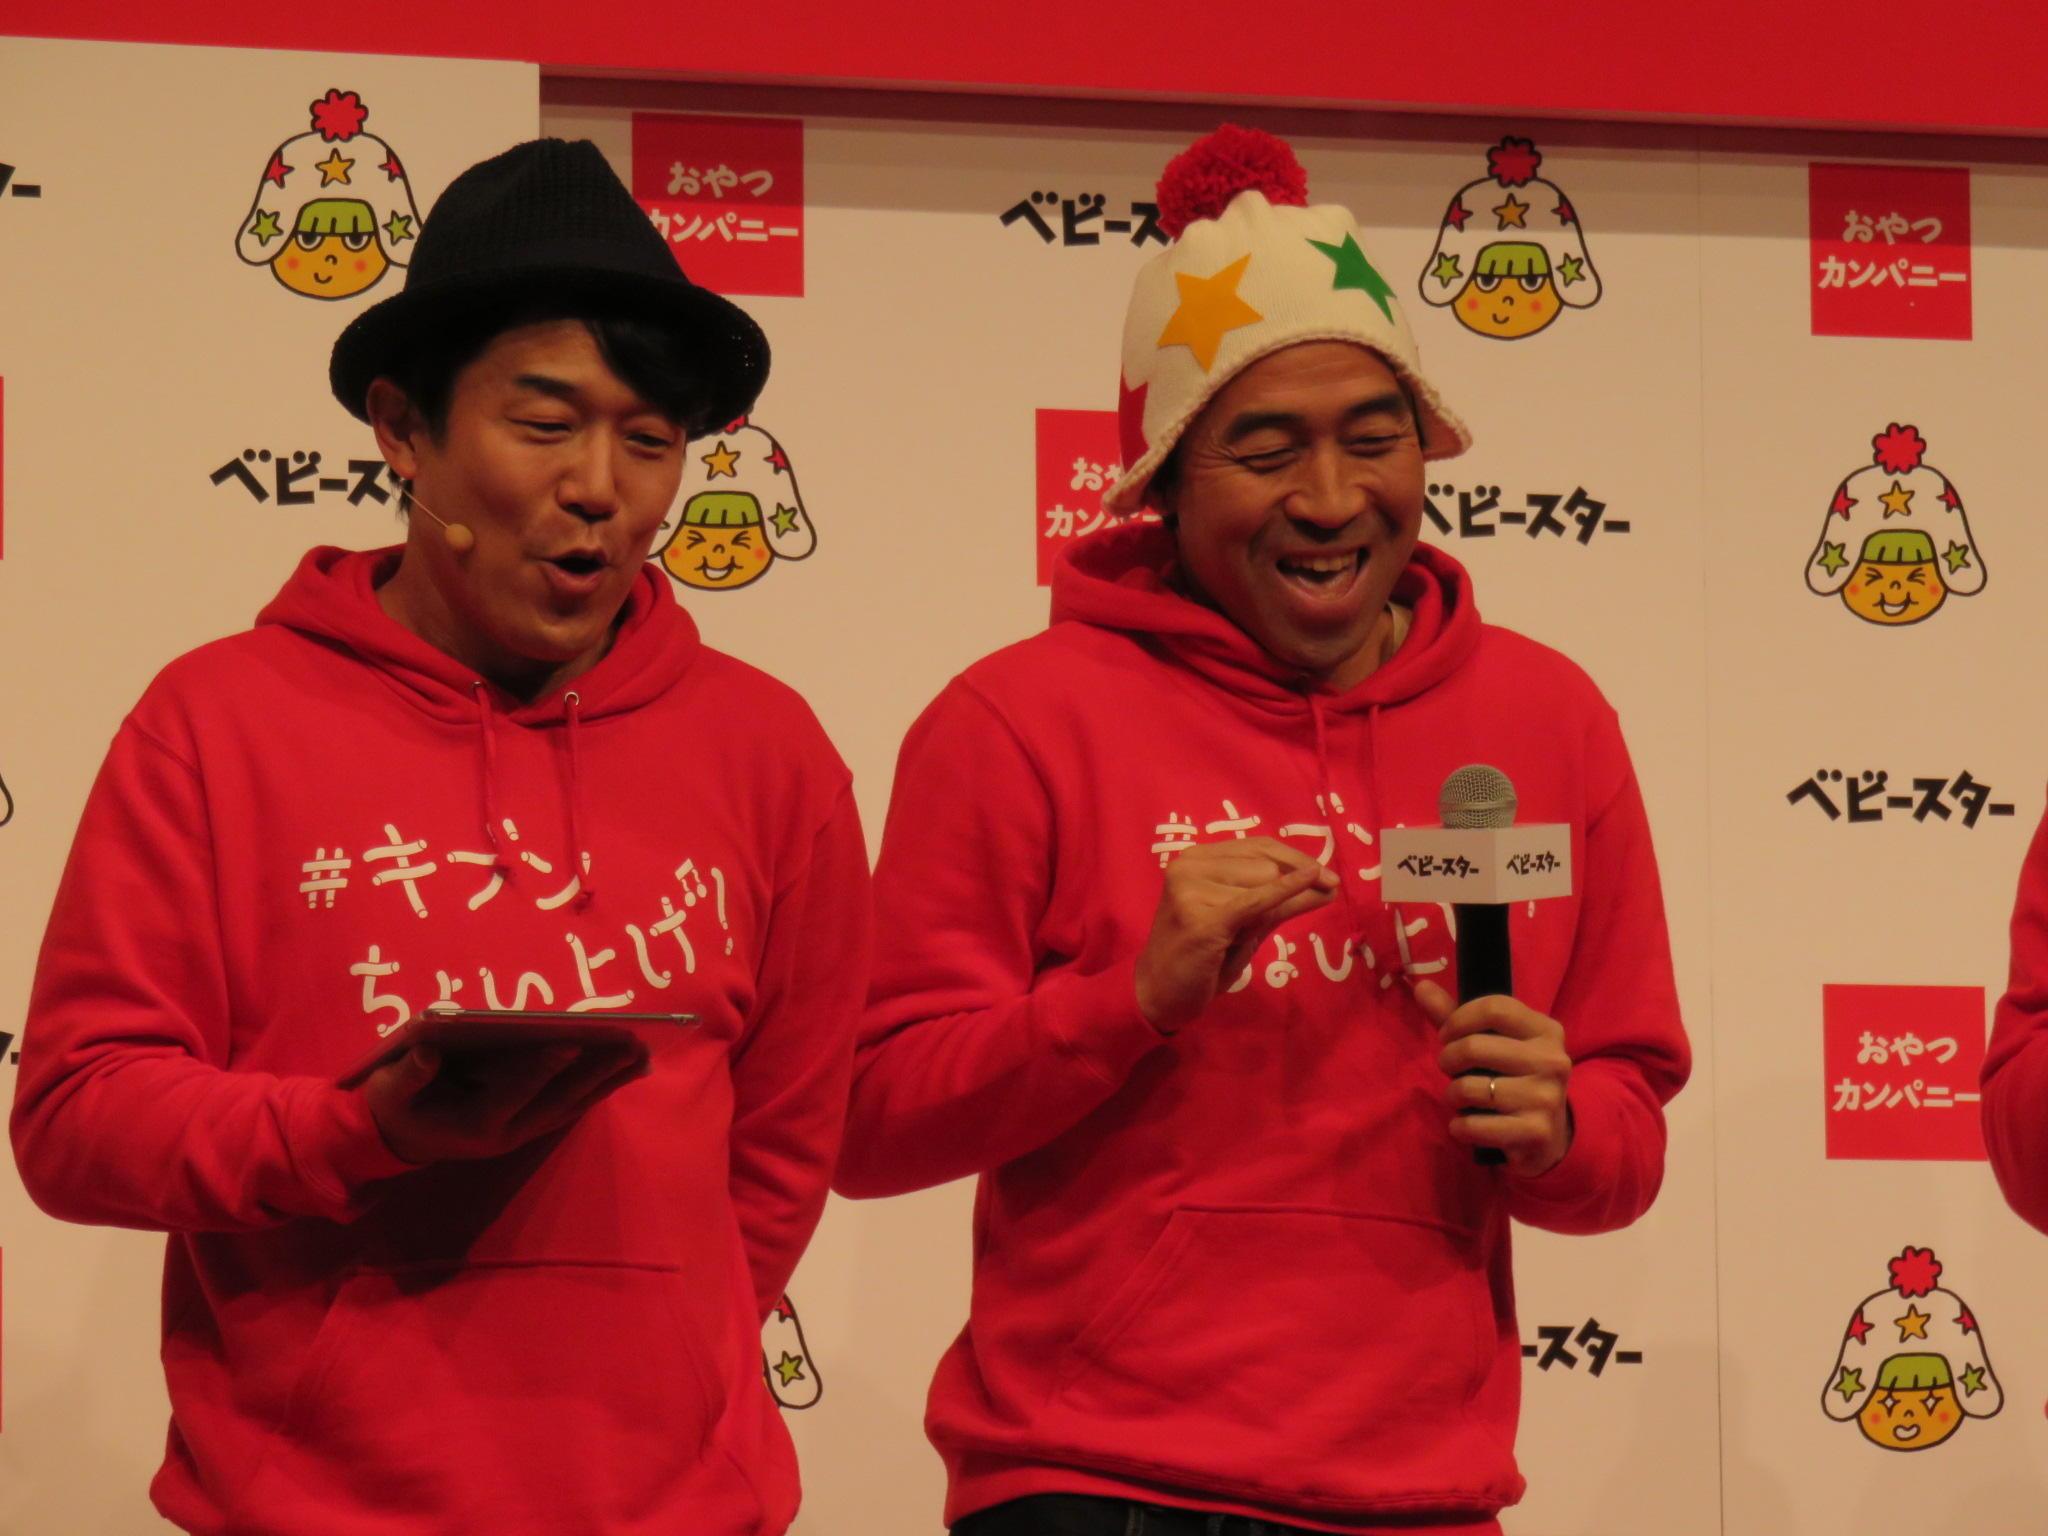 http://news.yoshimoto.co.jp/20170131190303-c61c1fb36fffd592545b88f8c8152d33ae9f076e.jpg